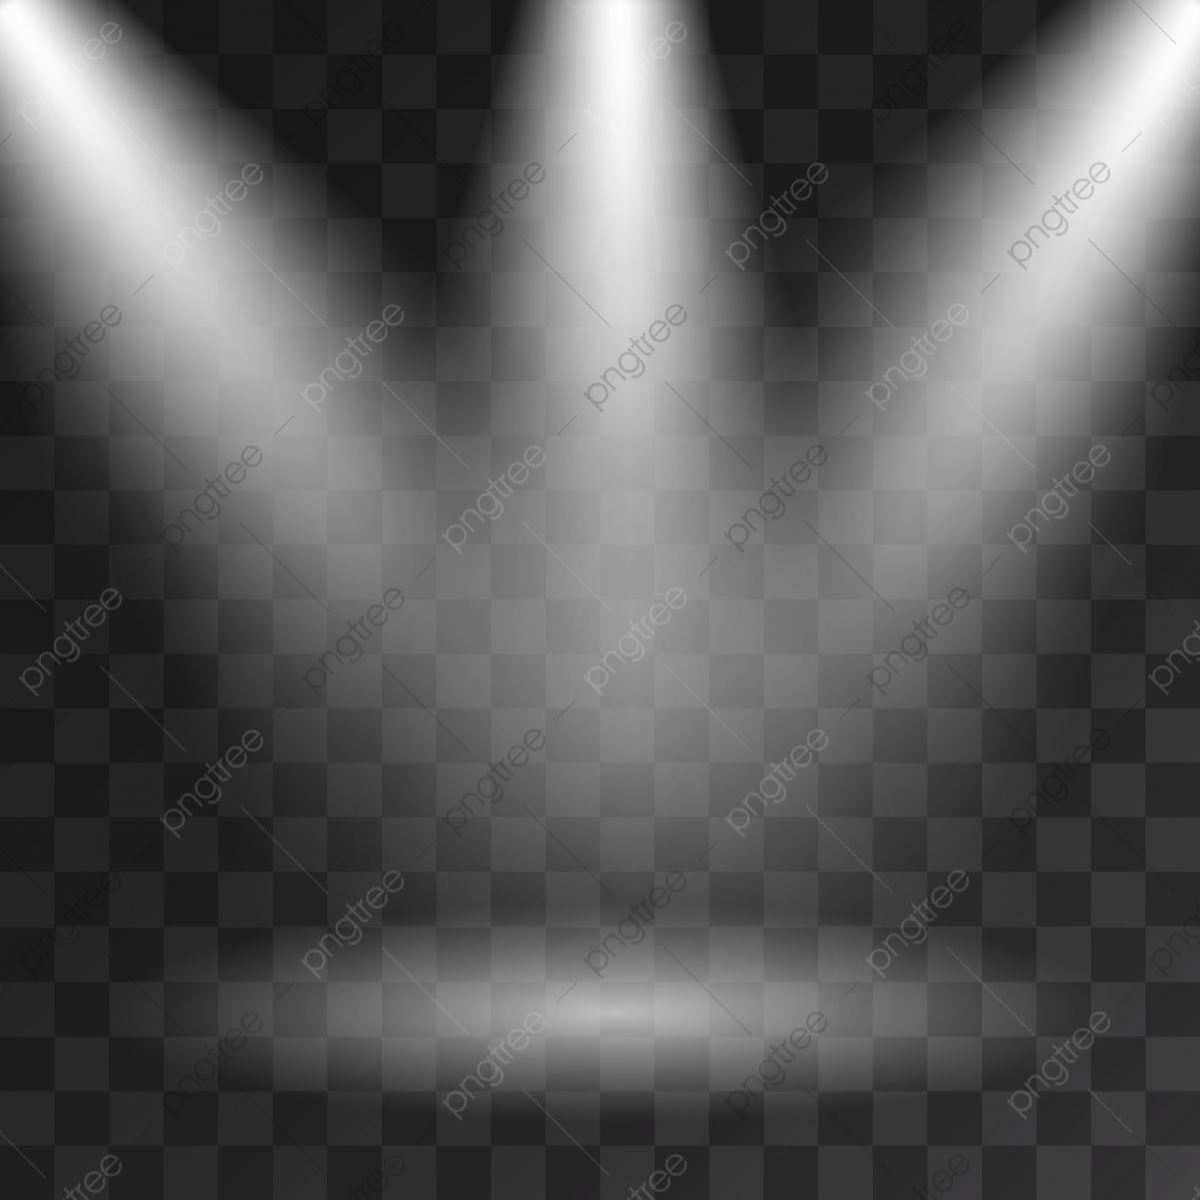 Modern 3 Shiny Spot Light On Transparent Background Spotlight Clipart Spotlight Light Png And Vector With Transparent Background For Free Download Black and white point angle pattern, light exposure, spotlight, texture, white png. https pngtree com freepng modern 3 shiny spot light on transparent background 4141503 html